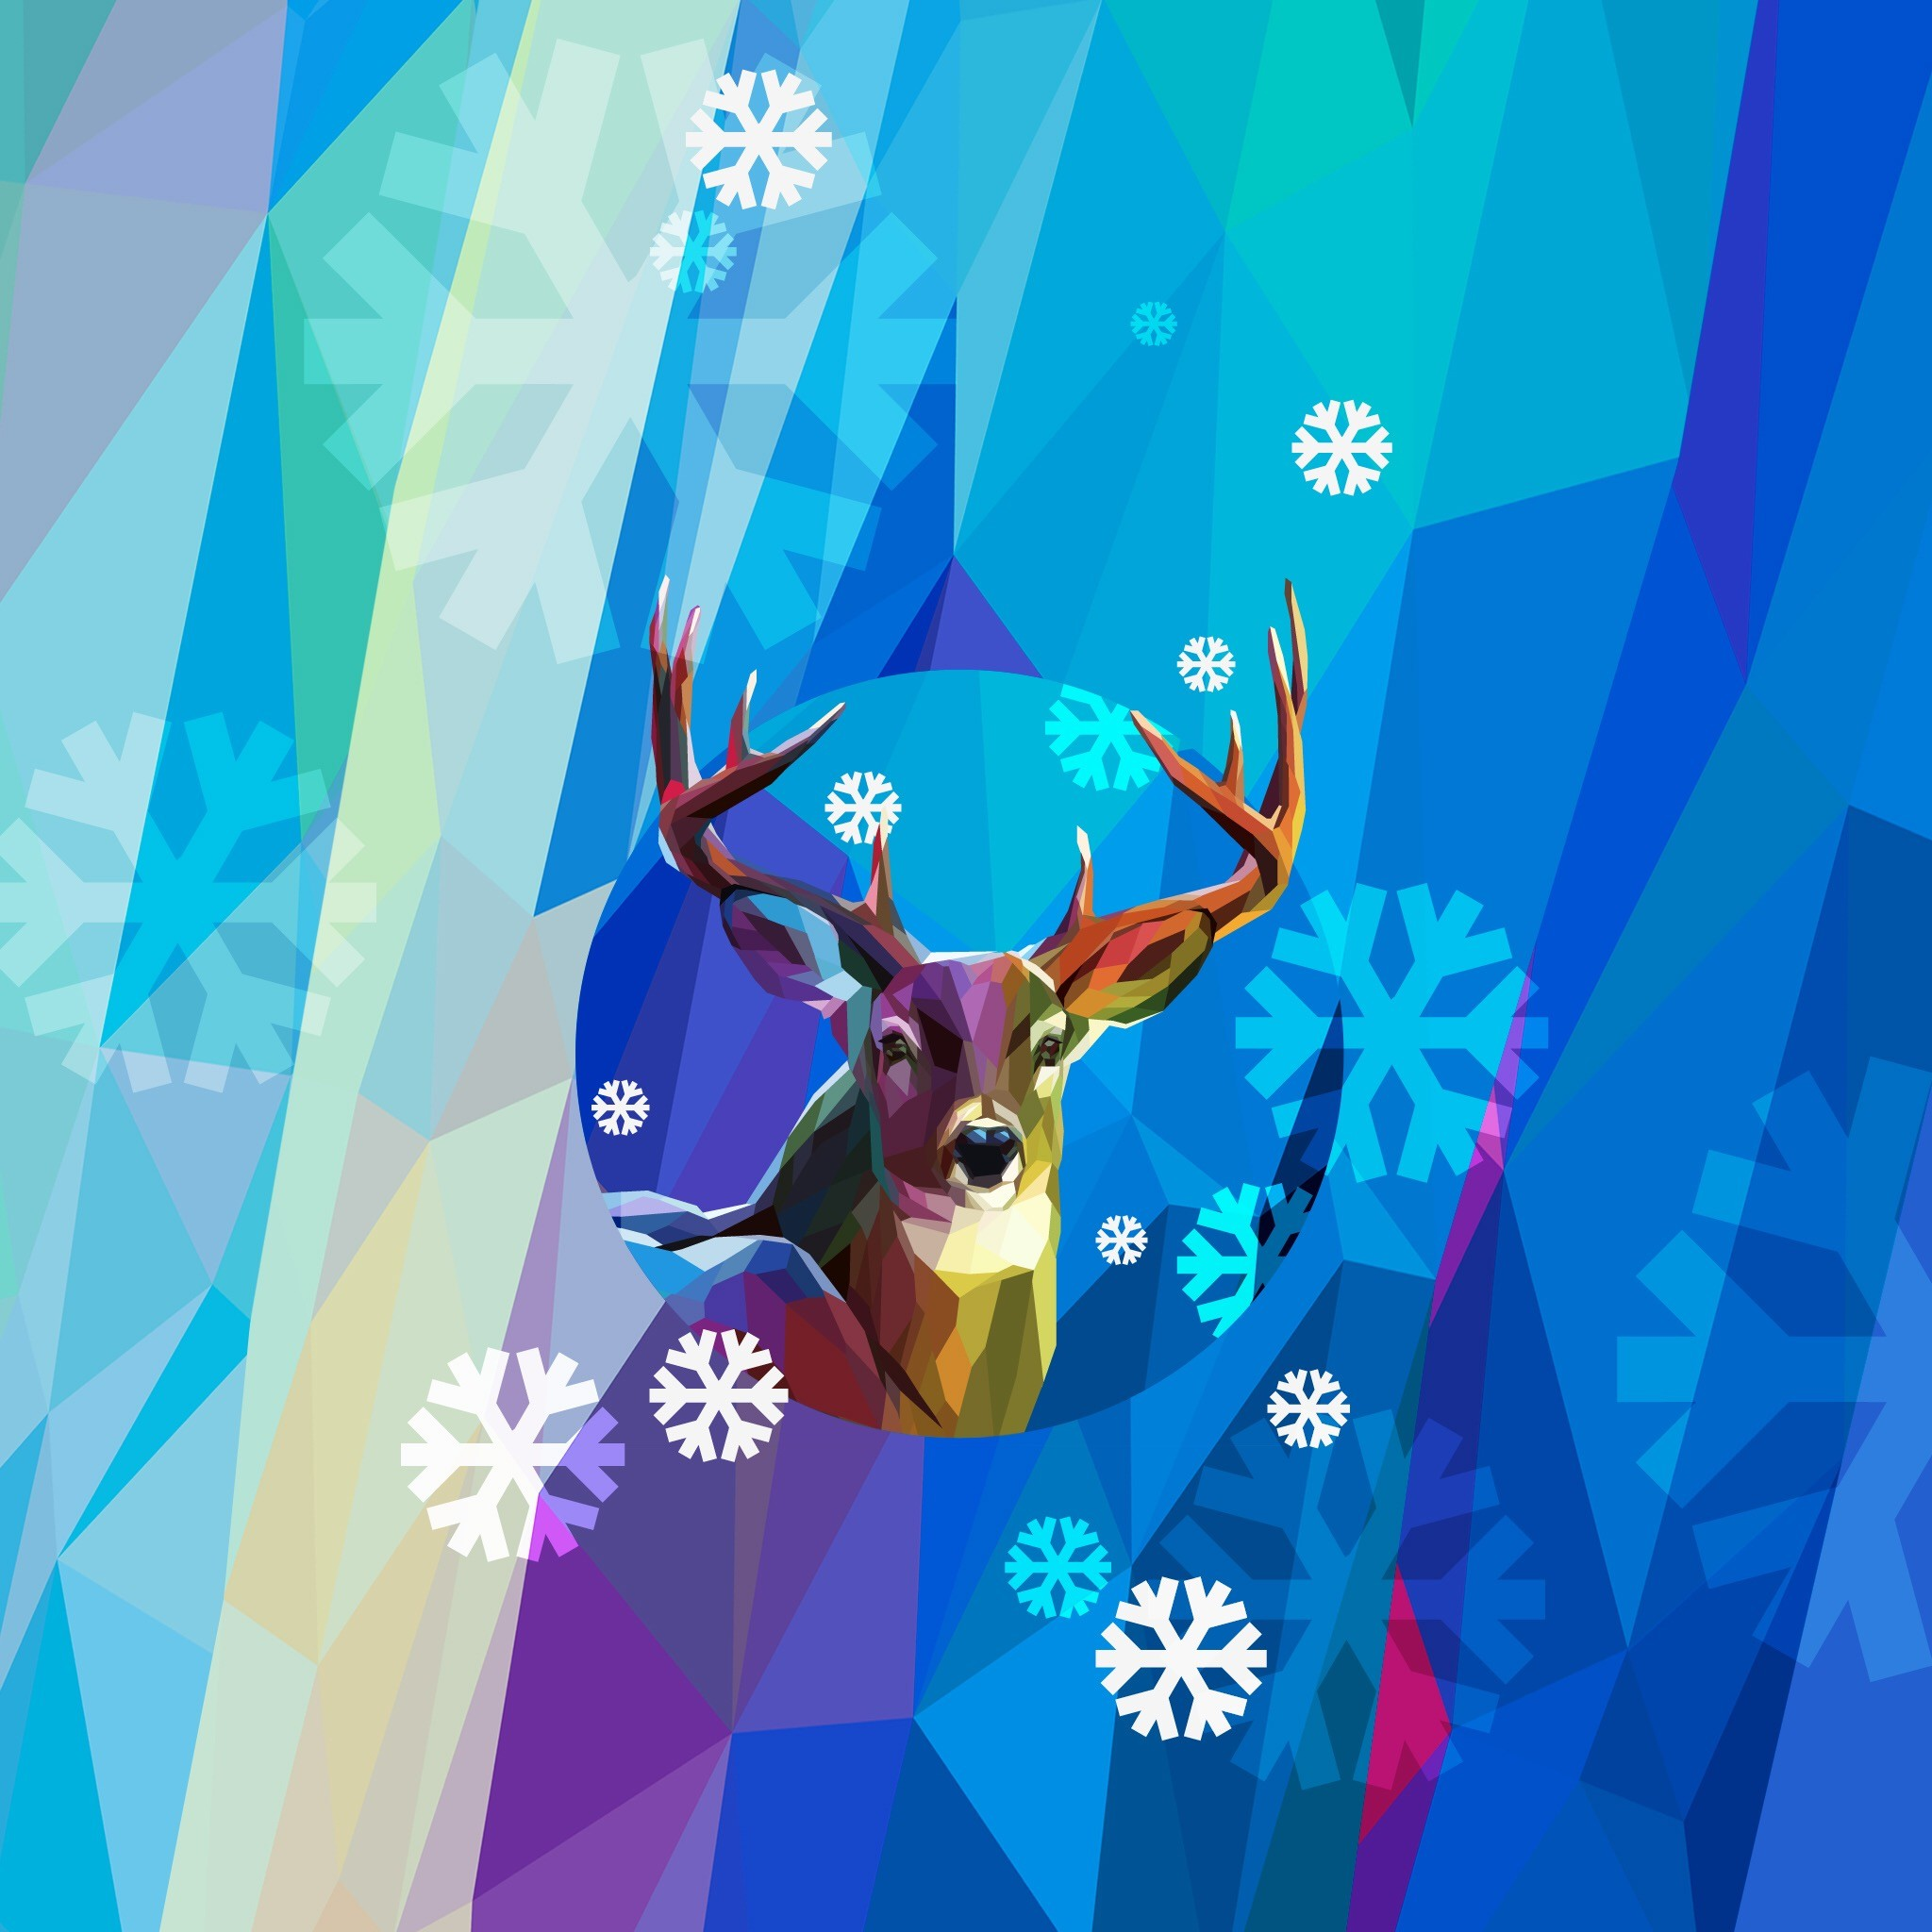 #unique #hd #deer #animal #wallpapers #background #nature #rain